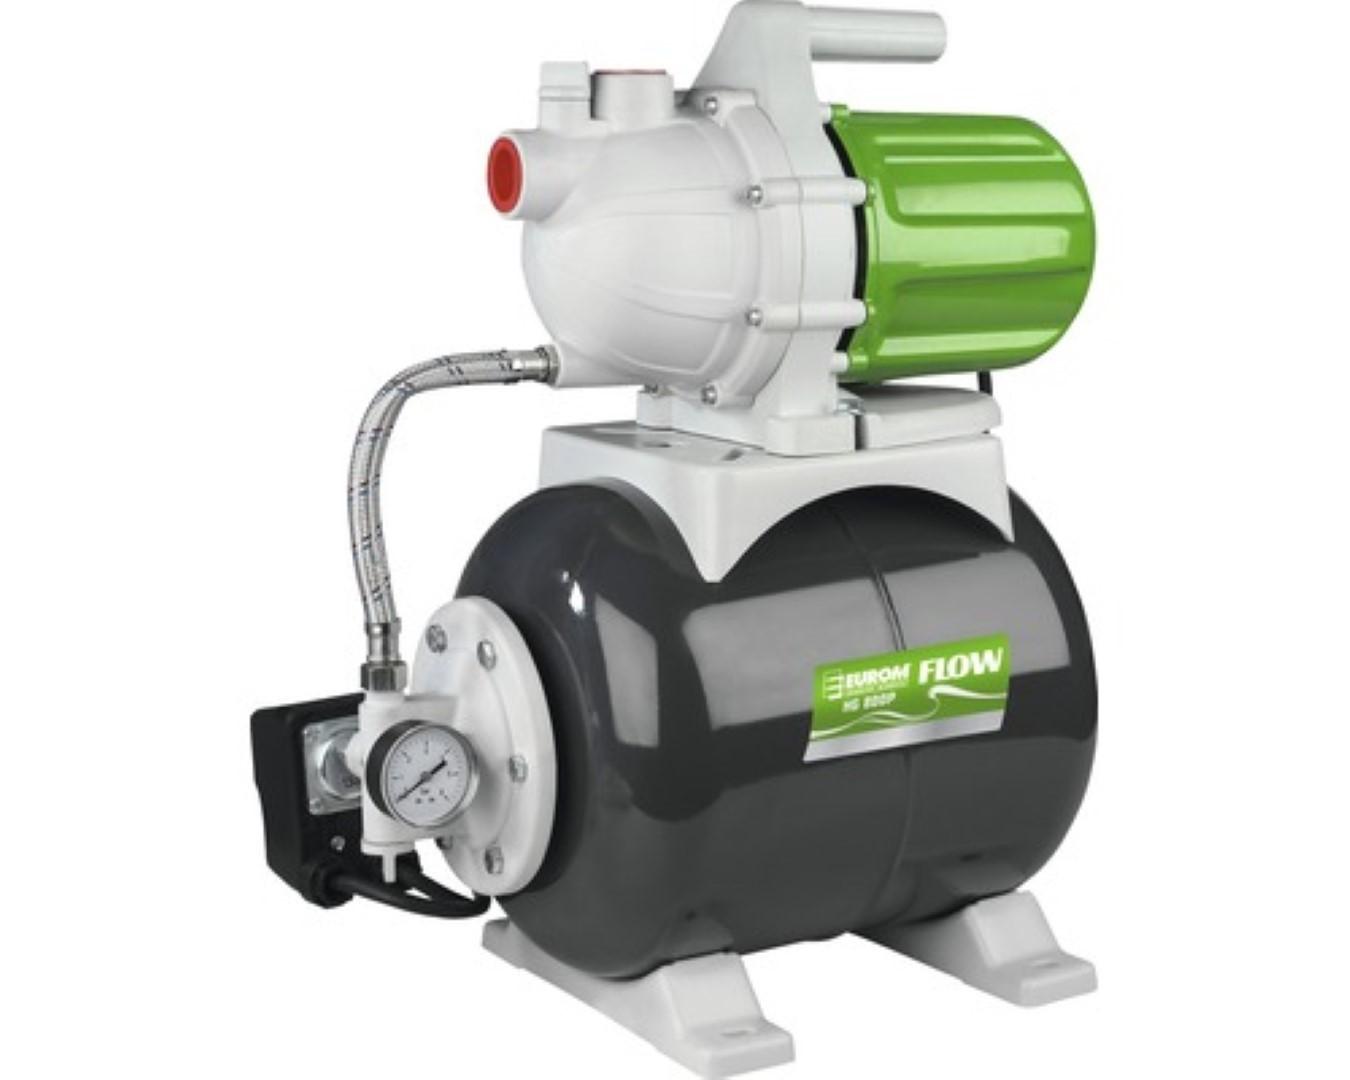 Hydrofoorgroep HG 800P